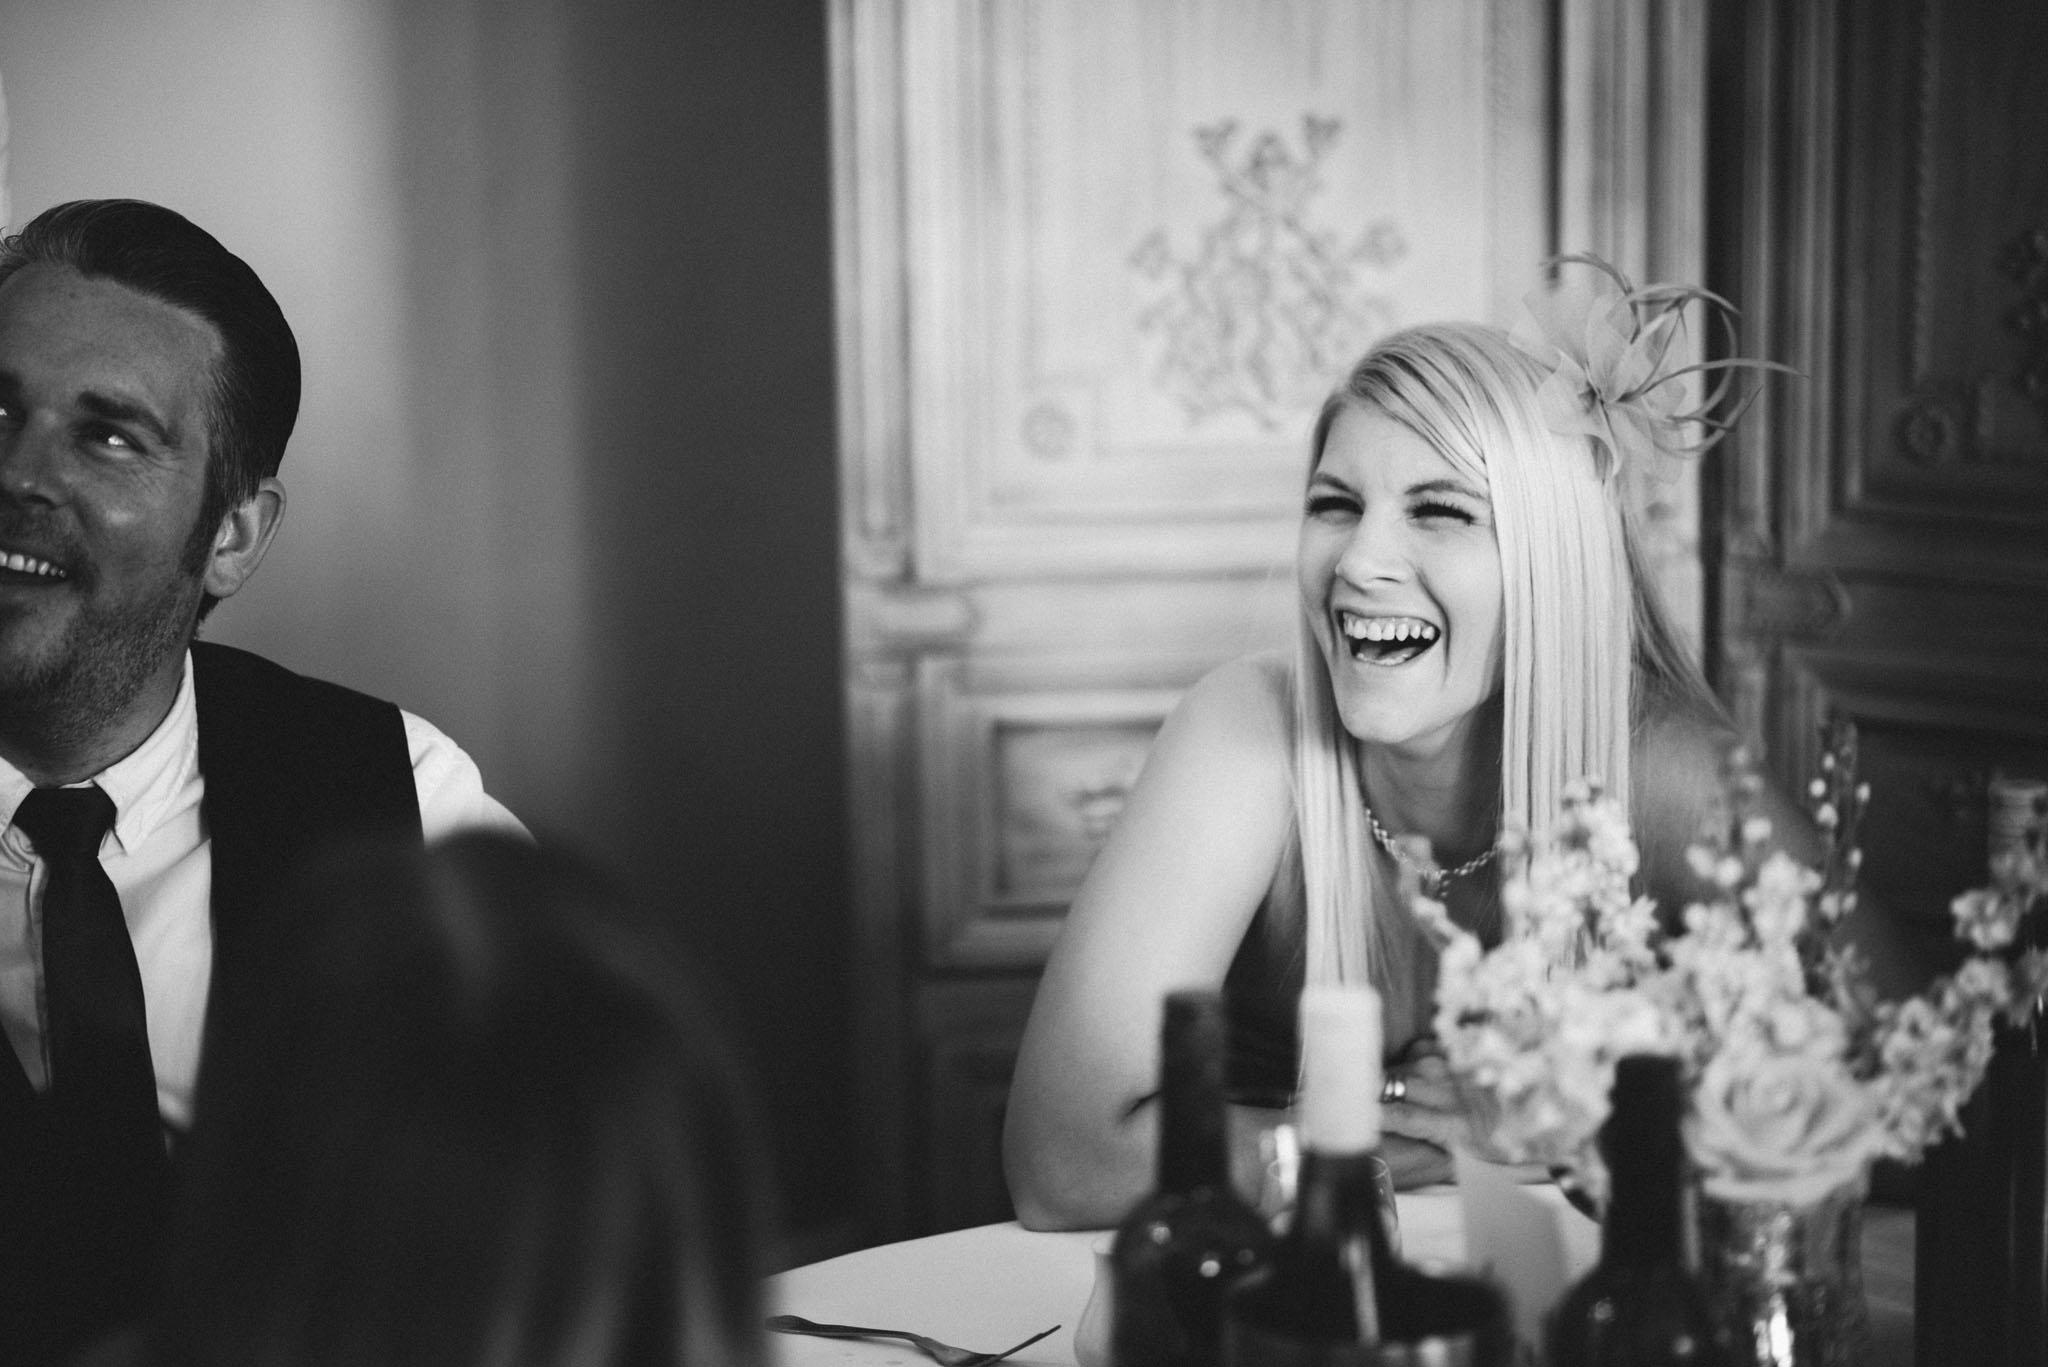 wedding-photographer-glewstone-court-hereford-scott-stockwell-photography390.jpg